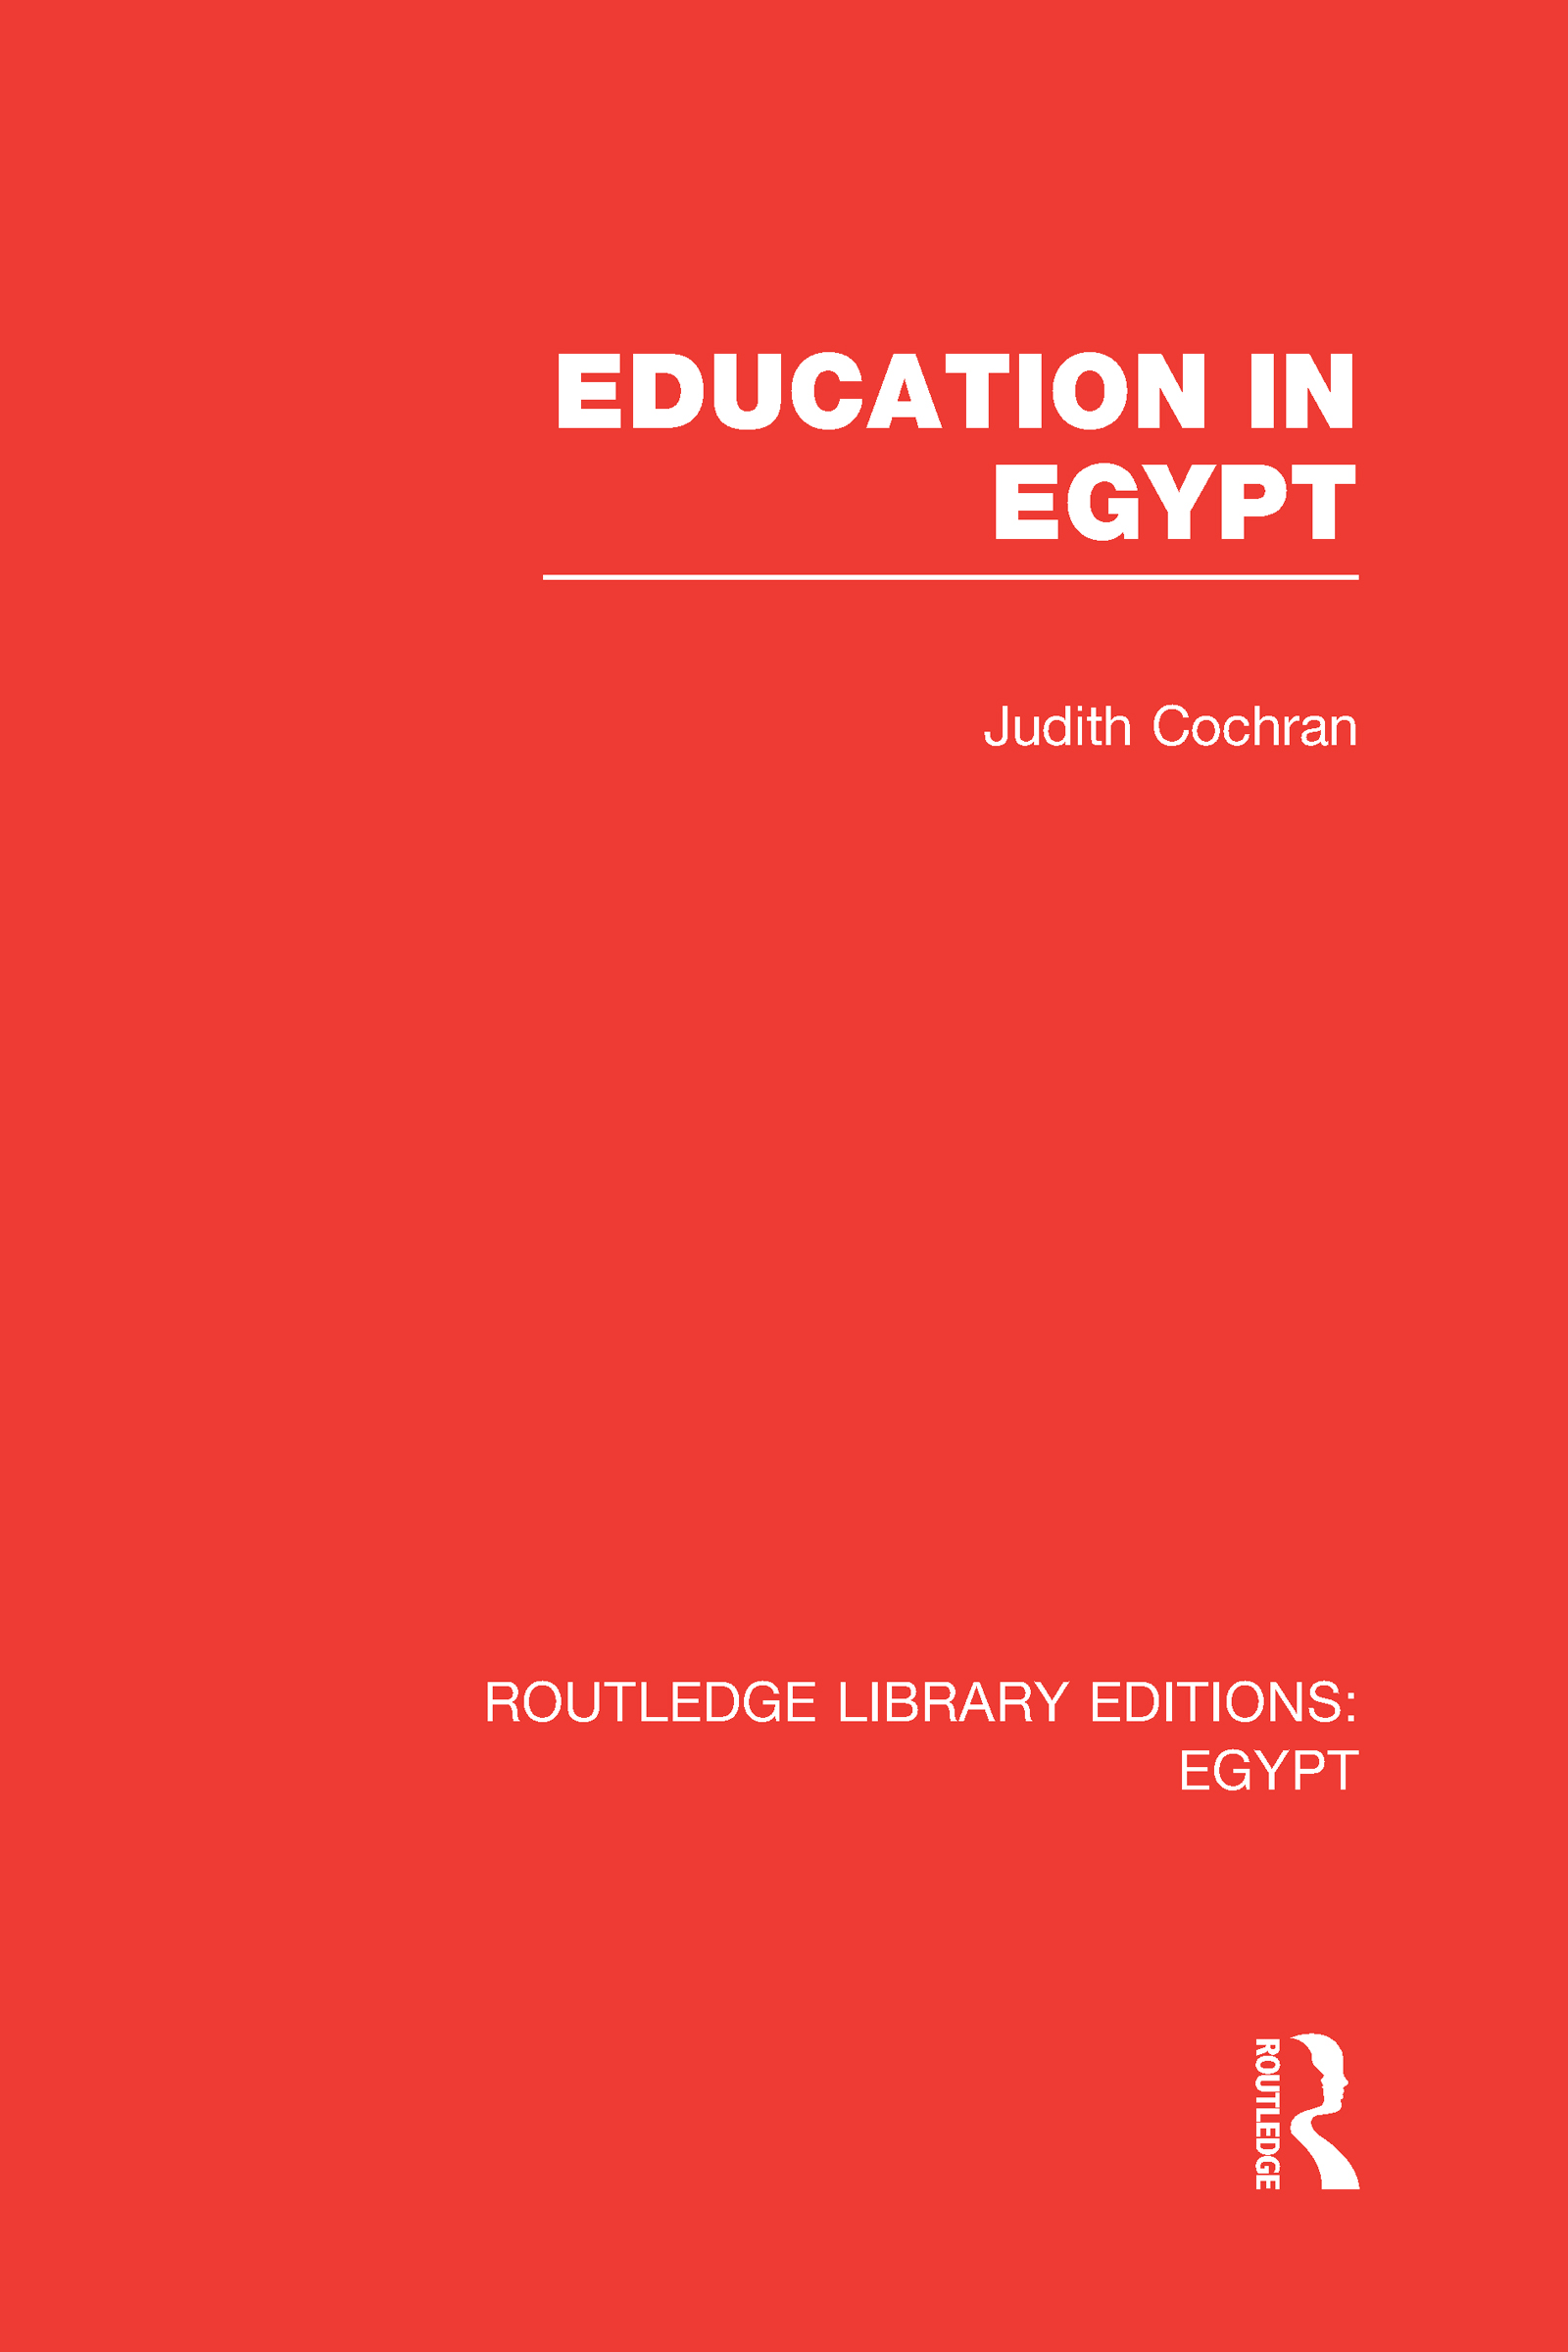 Education in Egypt (RLE Egypt) (Hardback) book cover